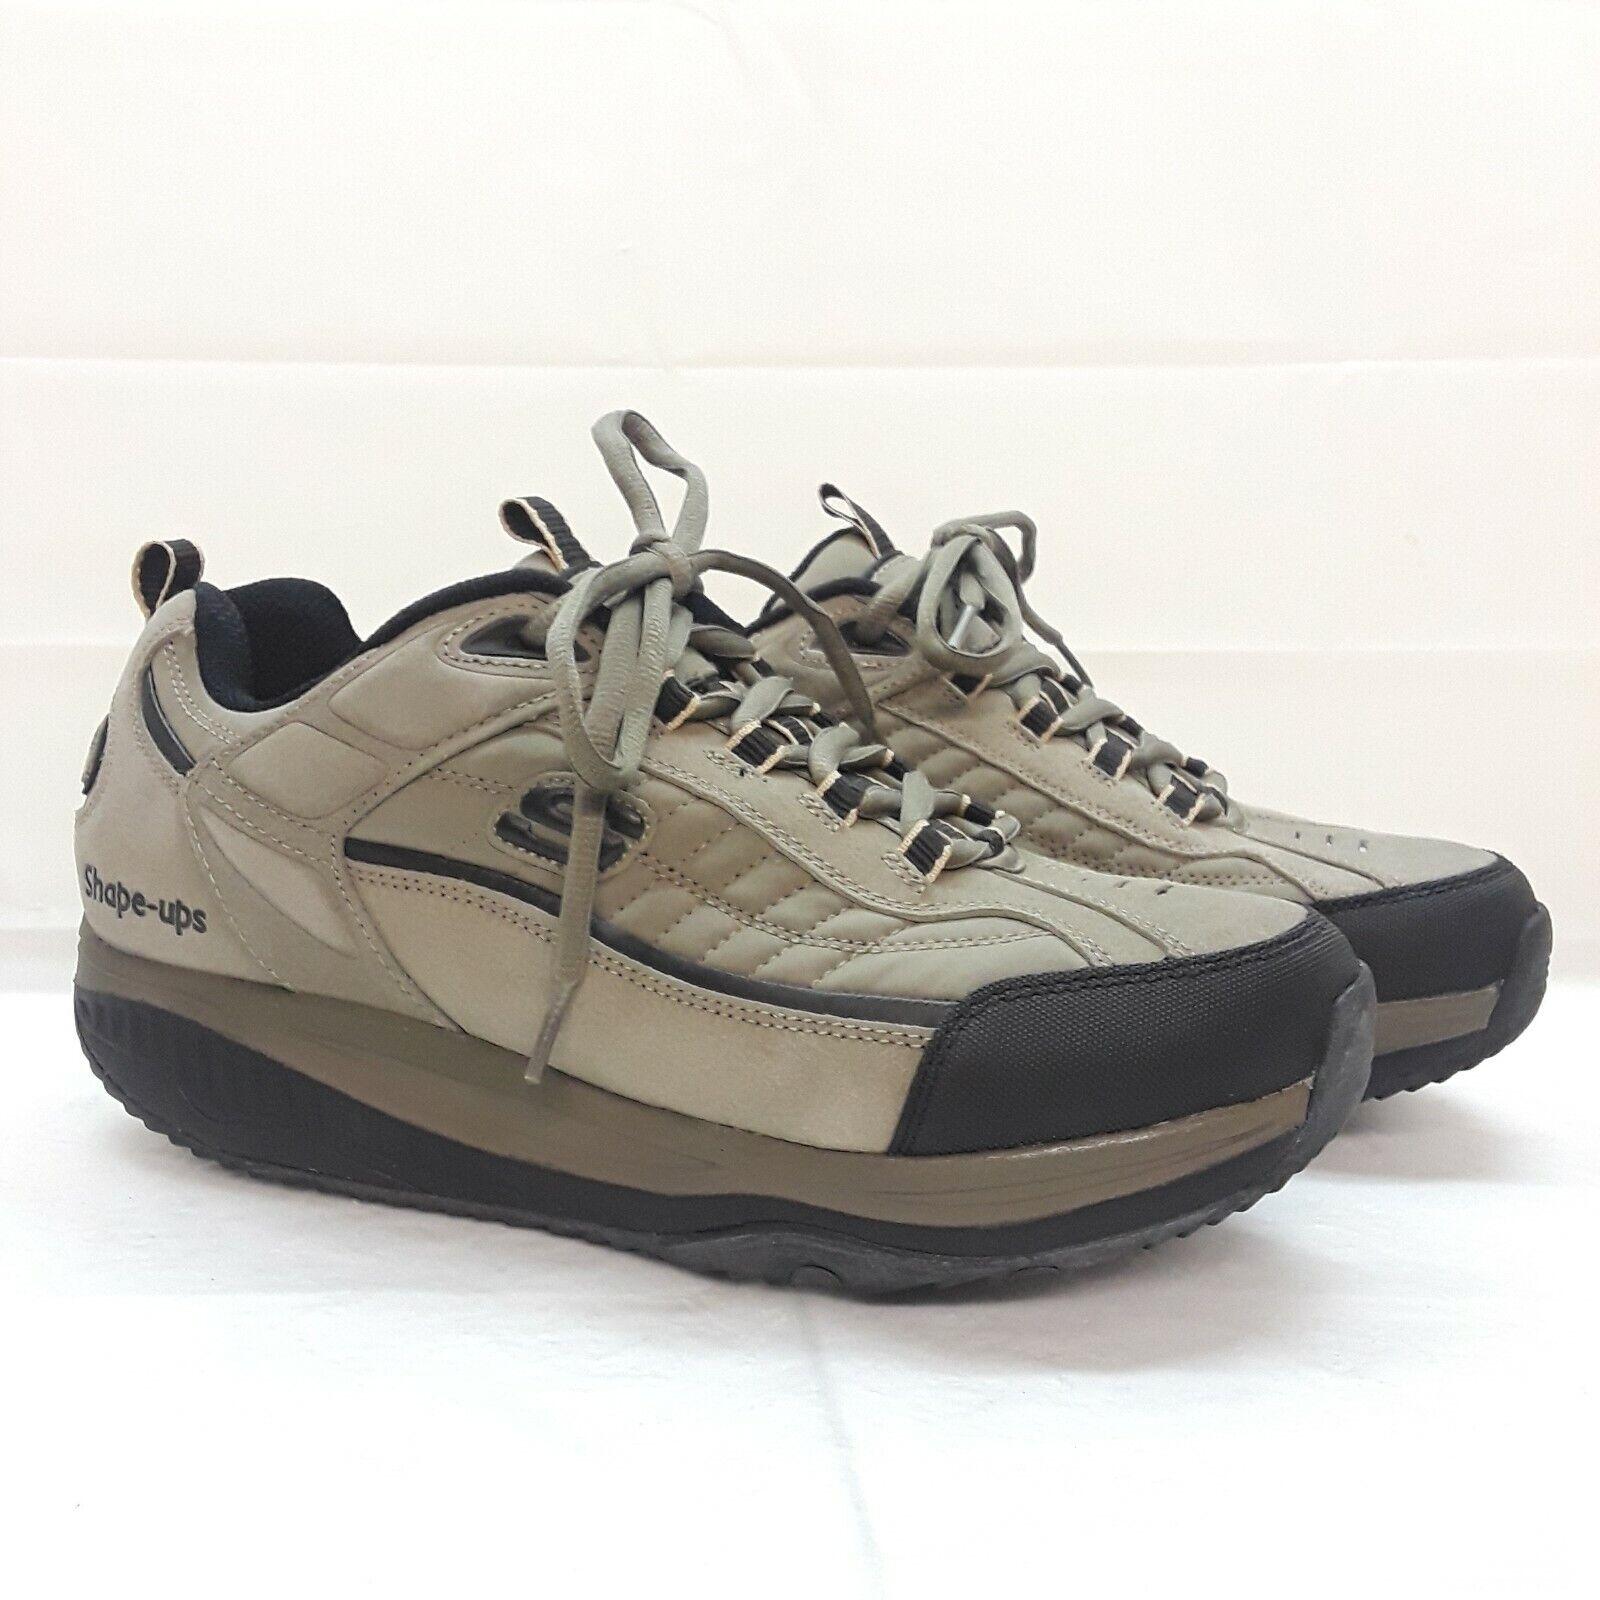 Río arriba Chicle Pintura  Skechers Shape-Ups XT купить на eBay в Америке, лот 274415744593